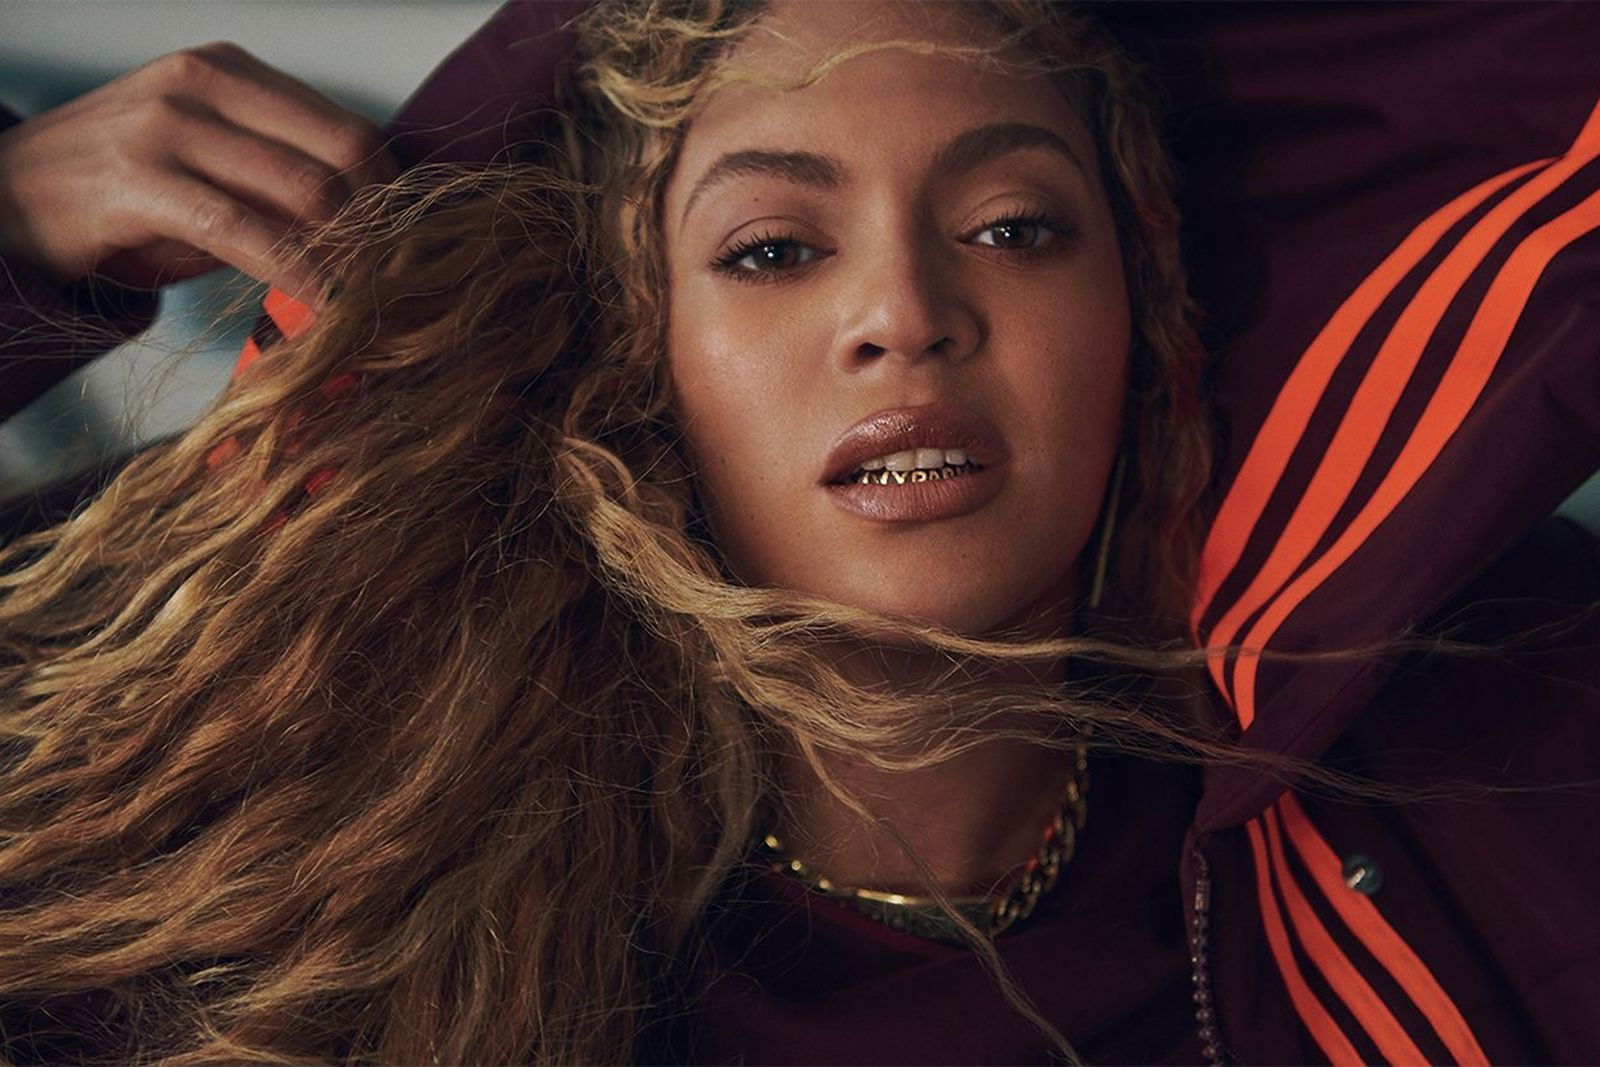 Beyonce Ivy Park adidas grillz